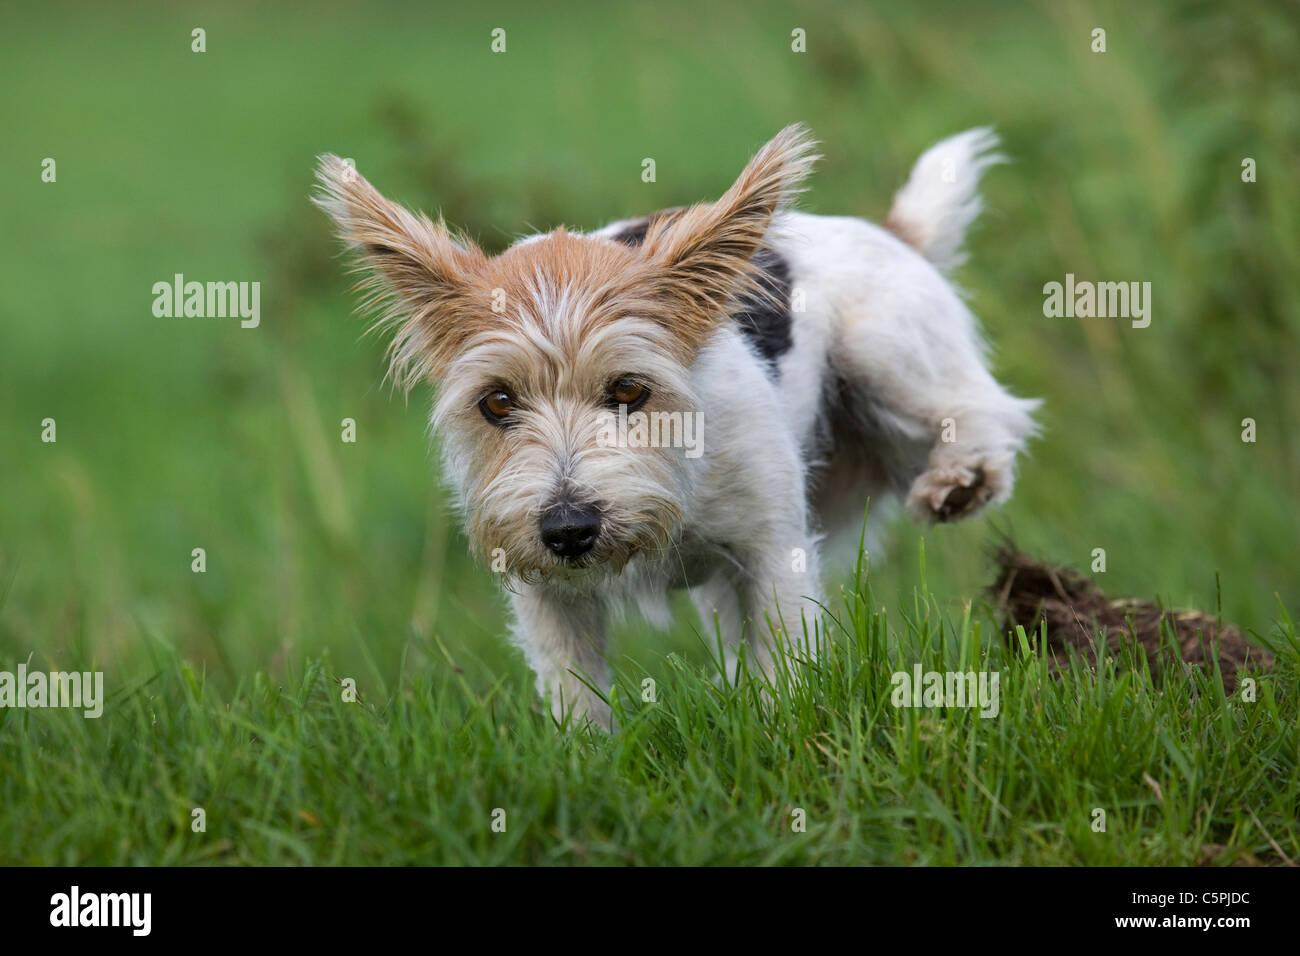 Rough-coated Jack Russell Terrier (Canis lupus familiaris) fonctionnant dans le champ Photo Stock